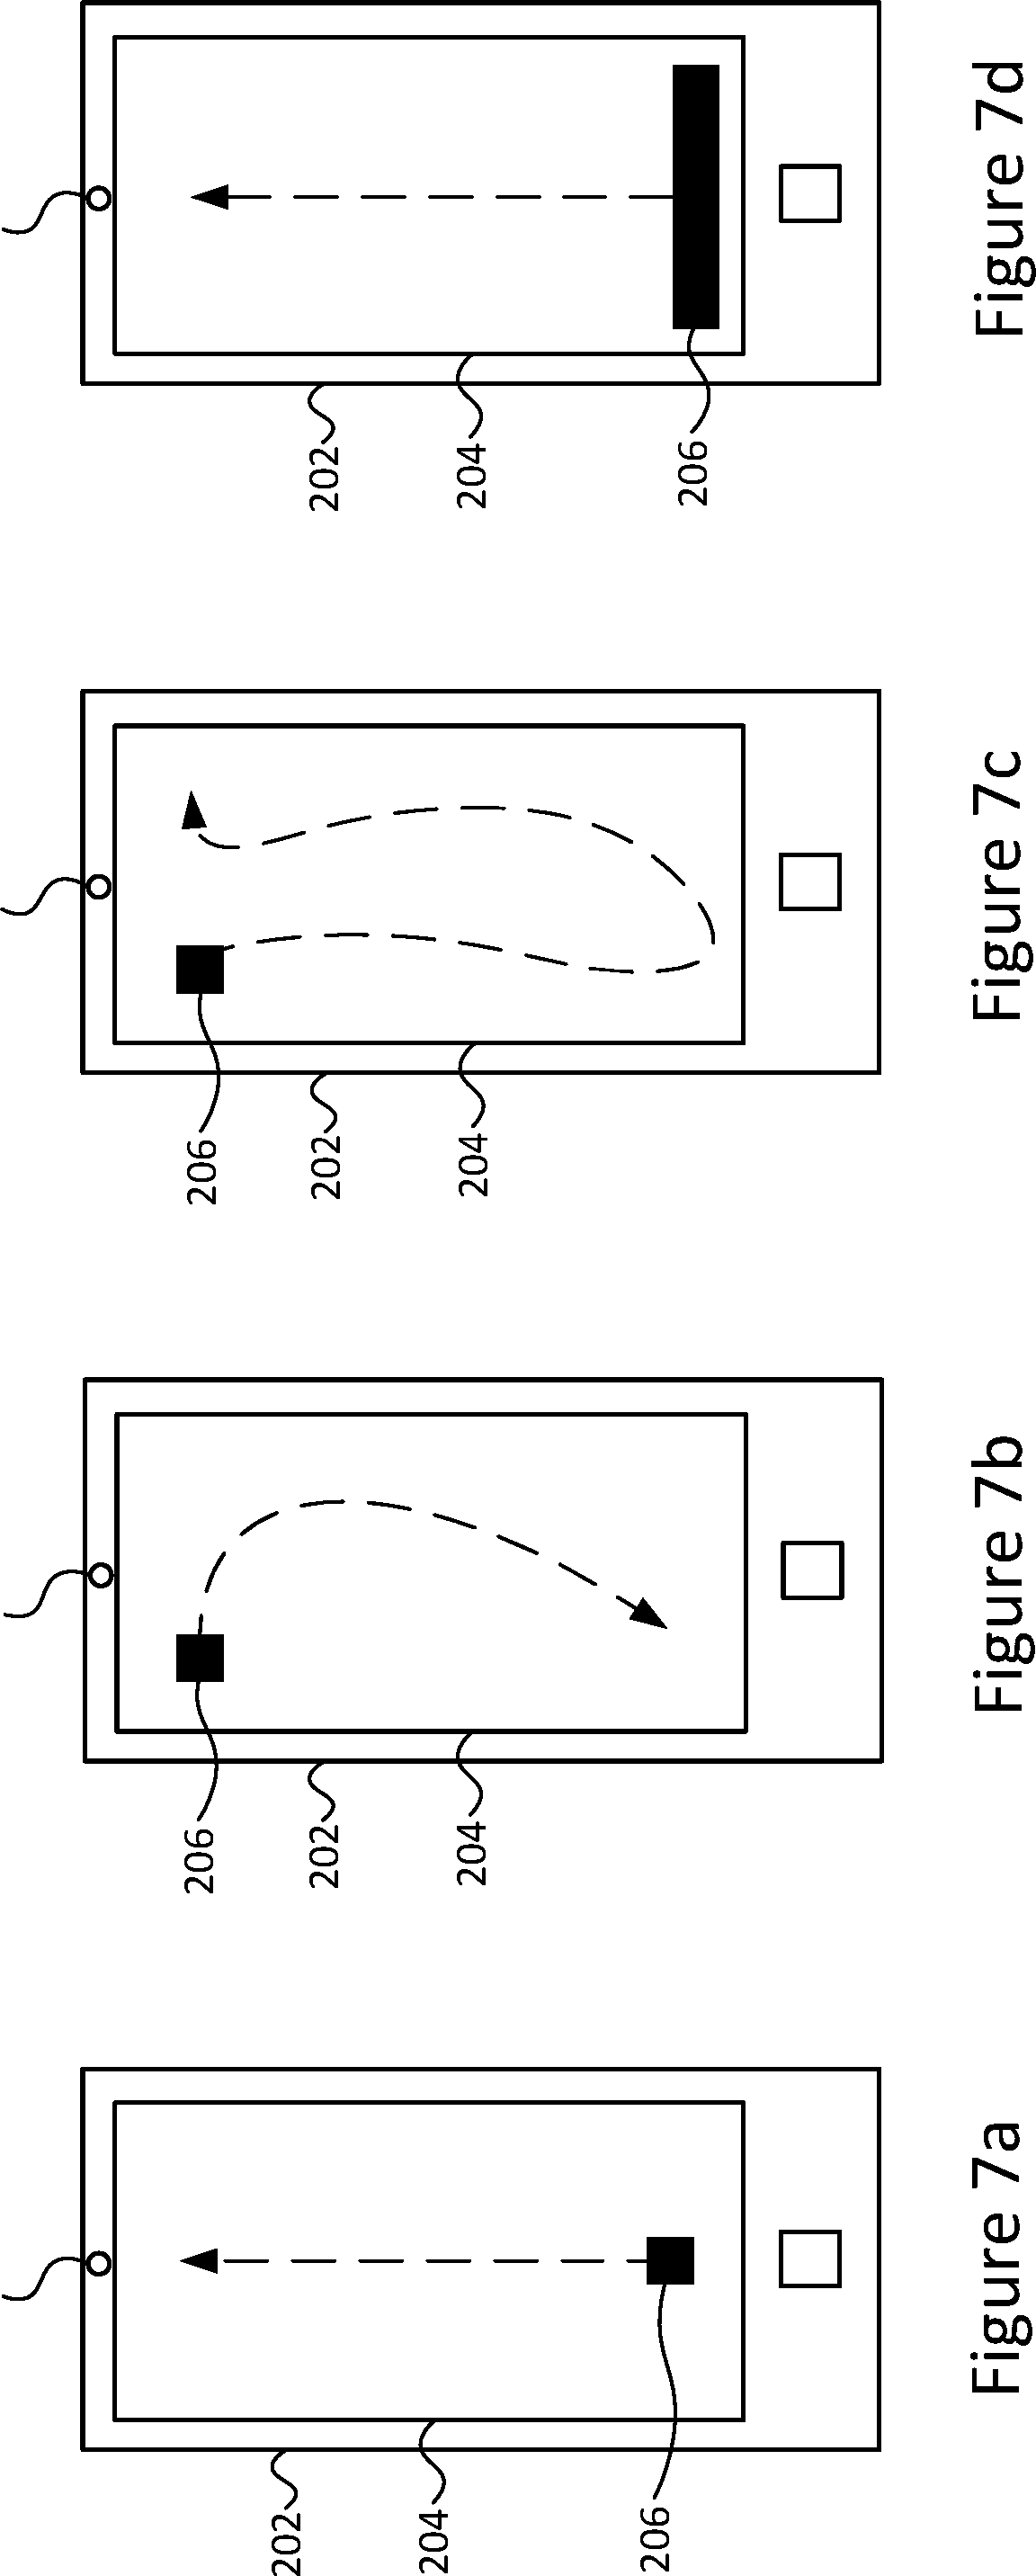 Figure GB2560340A_D0010